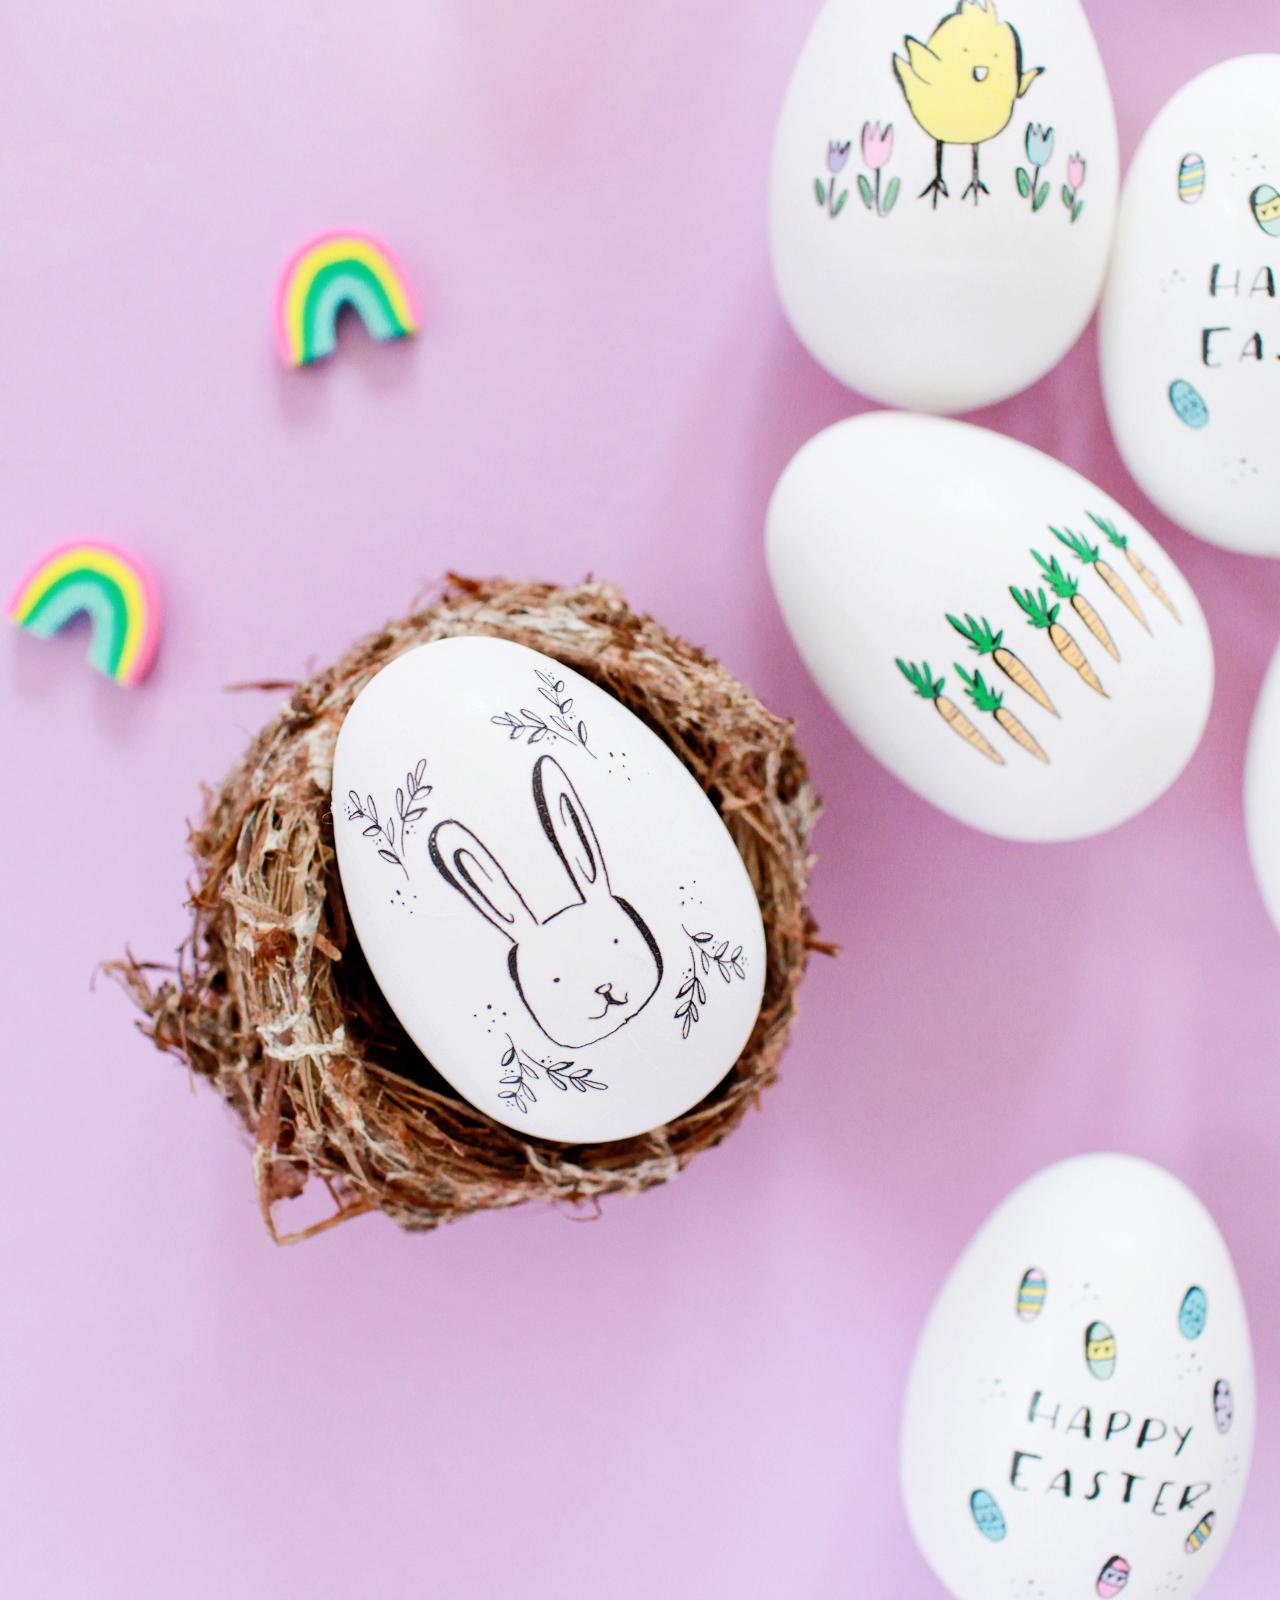 DIY Illustrated Temporary Tattoo Easter Eggs